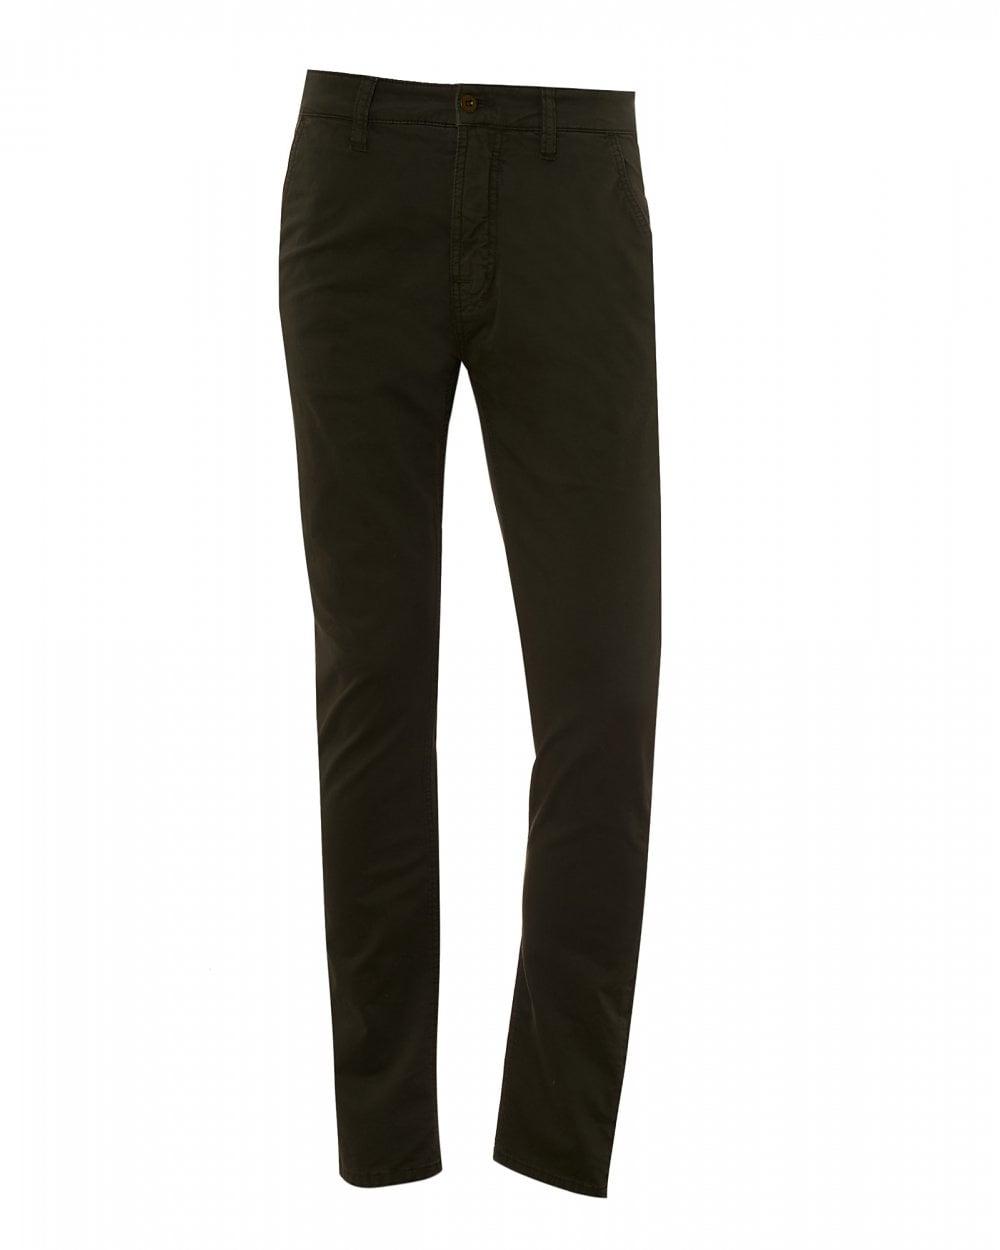 26bda57f562 Nudie Jeans Mens Slim Adam Chinos, Bunker Green Cotton Trousers